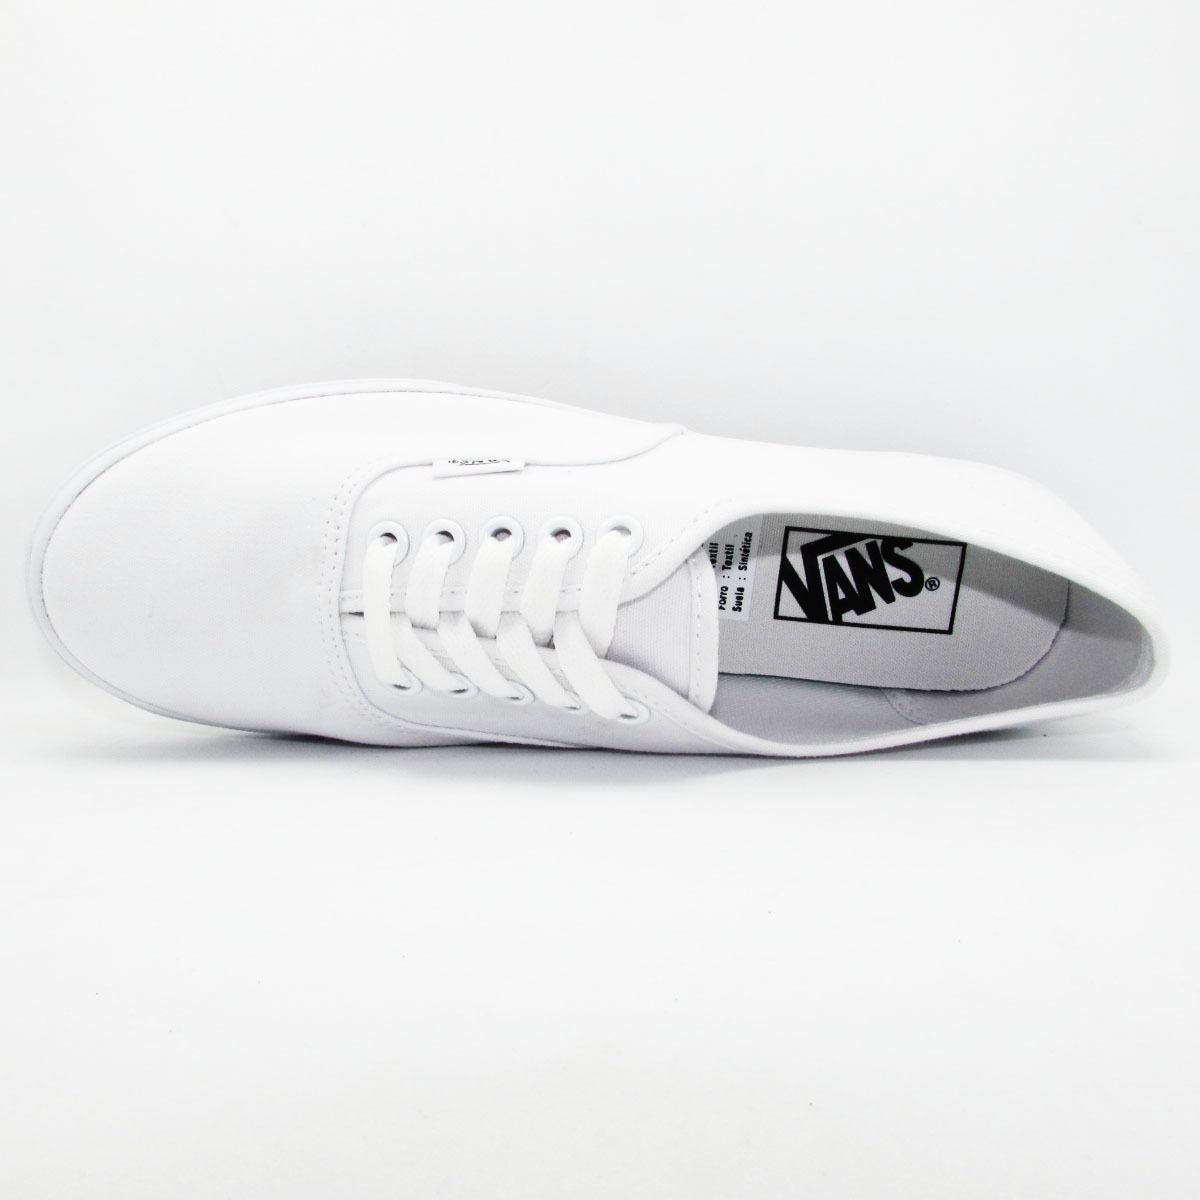 f4841e744dc tenis vans authentic classic lo pro vn000f7bqlz white blanco. Cargando zoom.